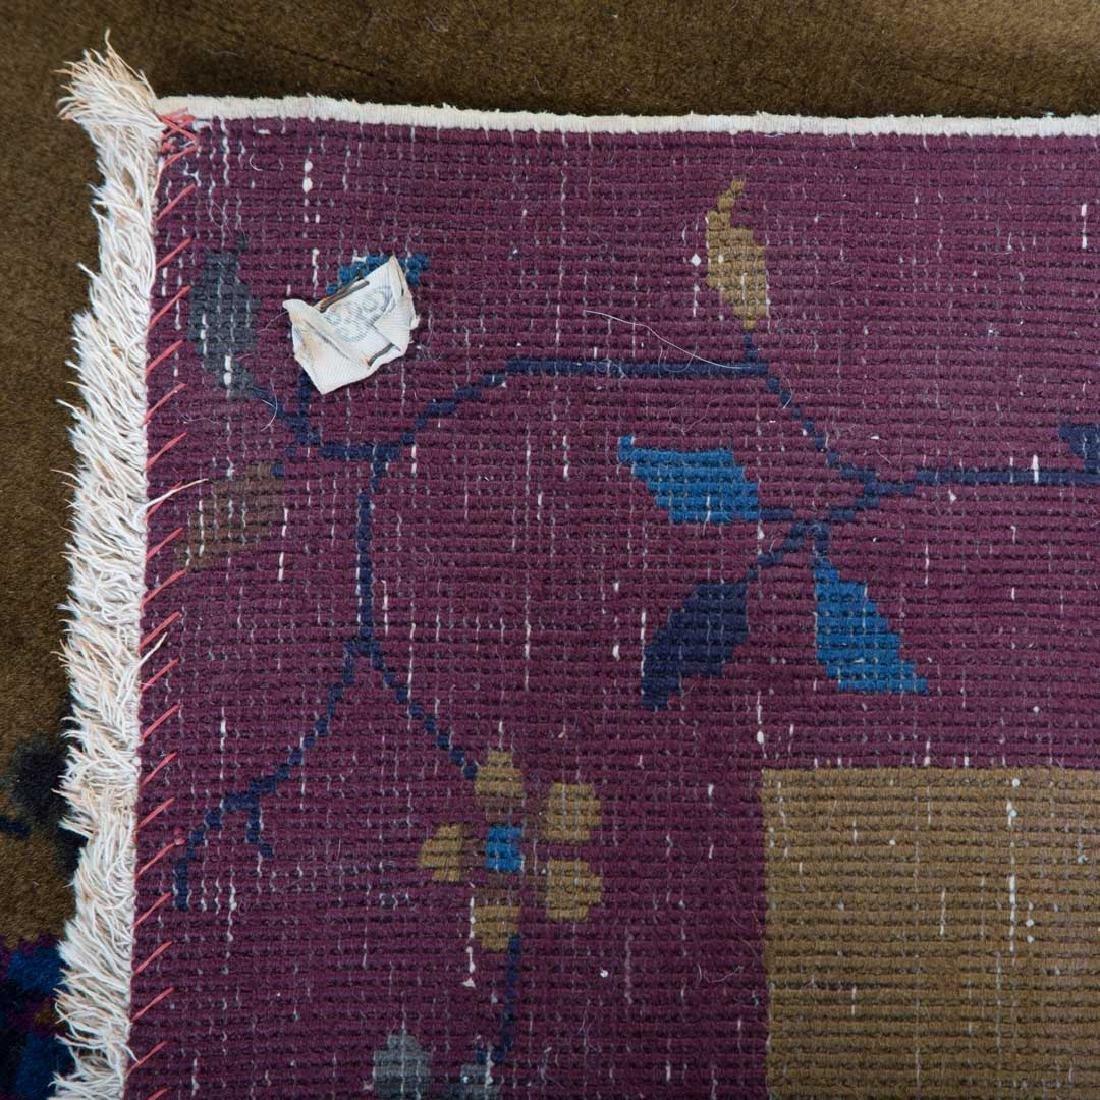 Antique Fette rug, approx. 4 x 6 - 3